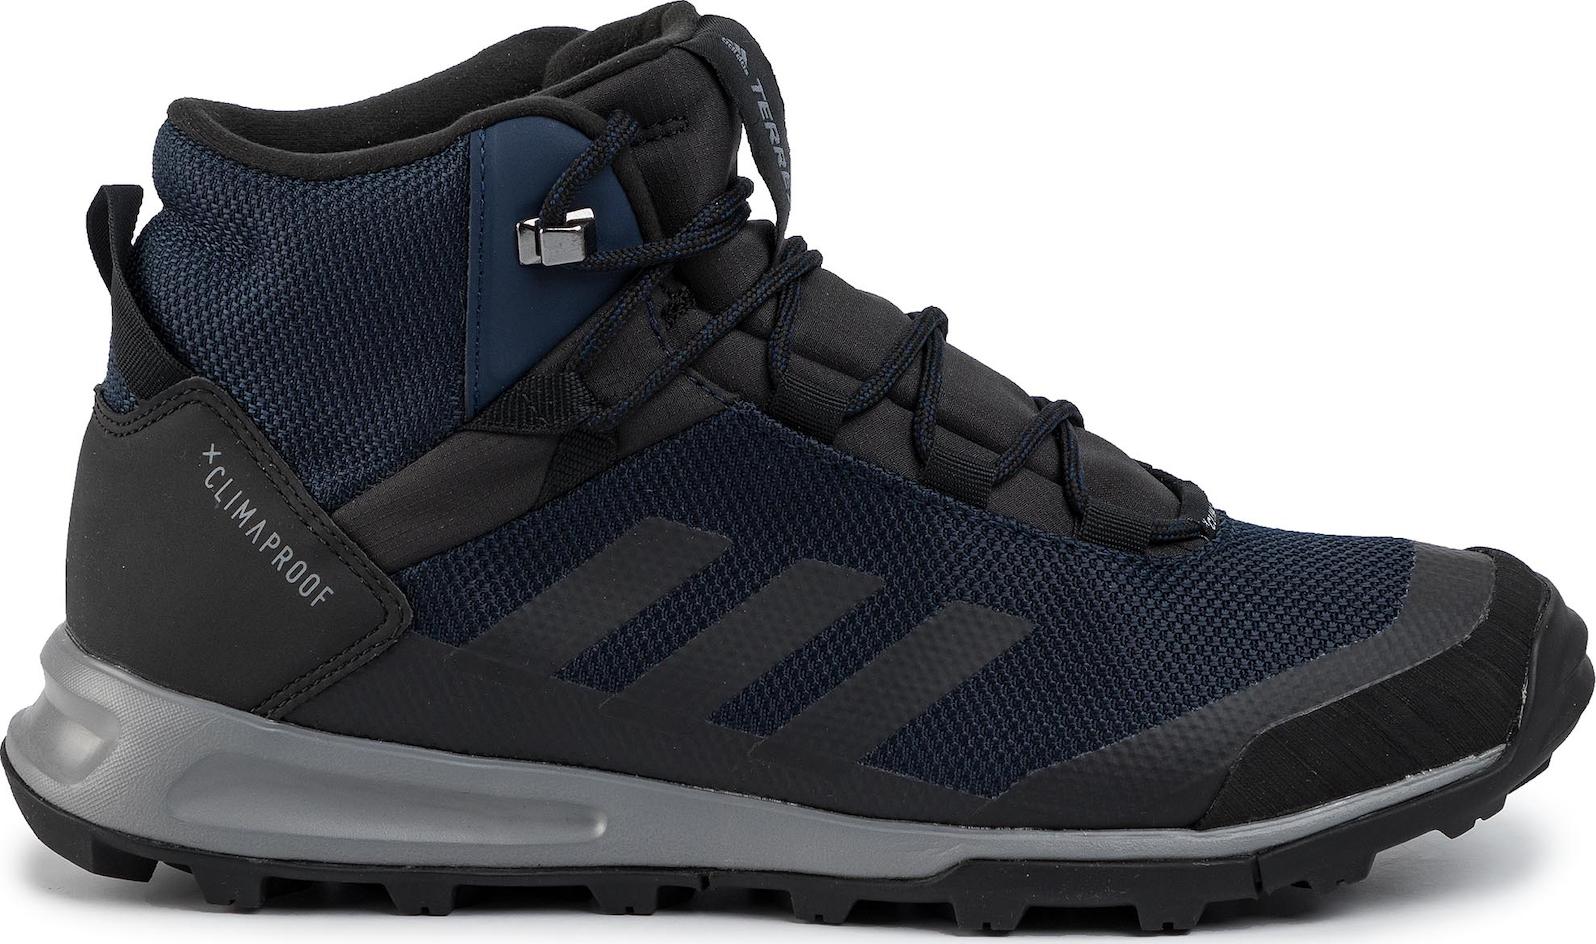 Adidas Terrex Tivid Mid Climaproof G26518 Ορειβατικά Ανδρικά Μποτάκια Αδιάβροχα